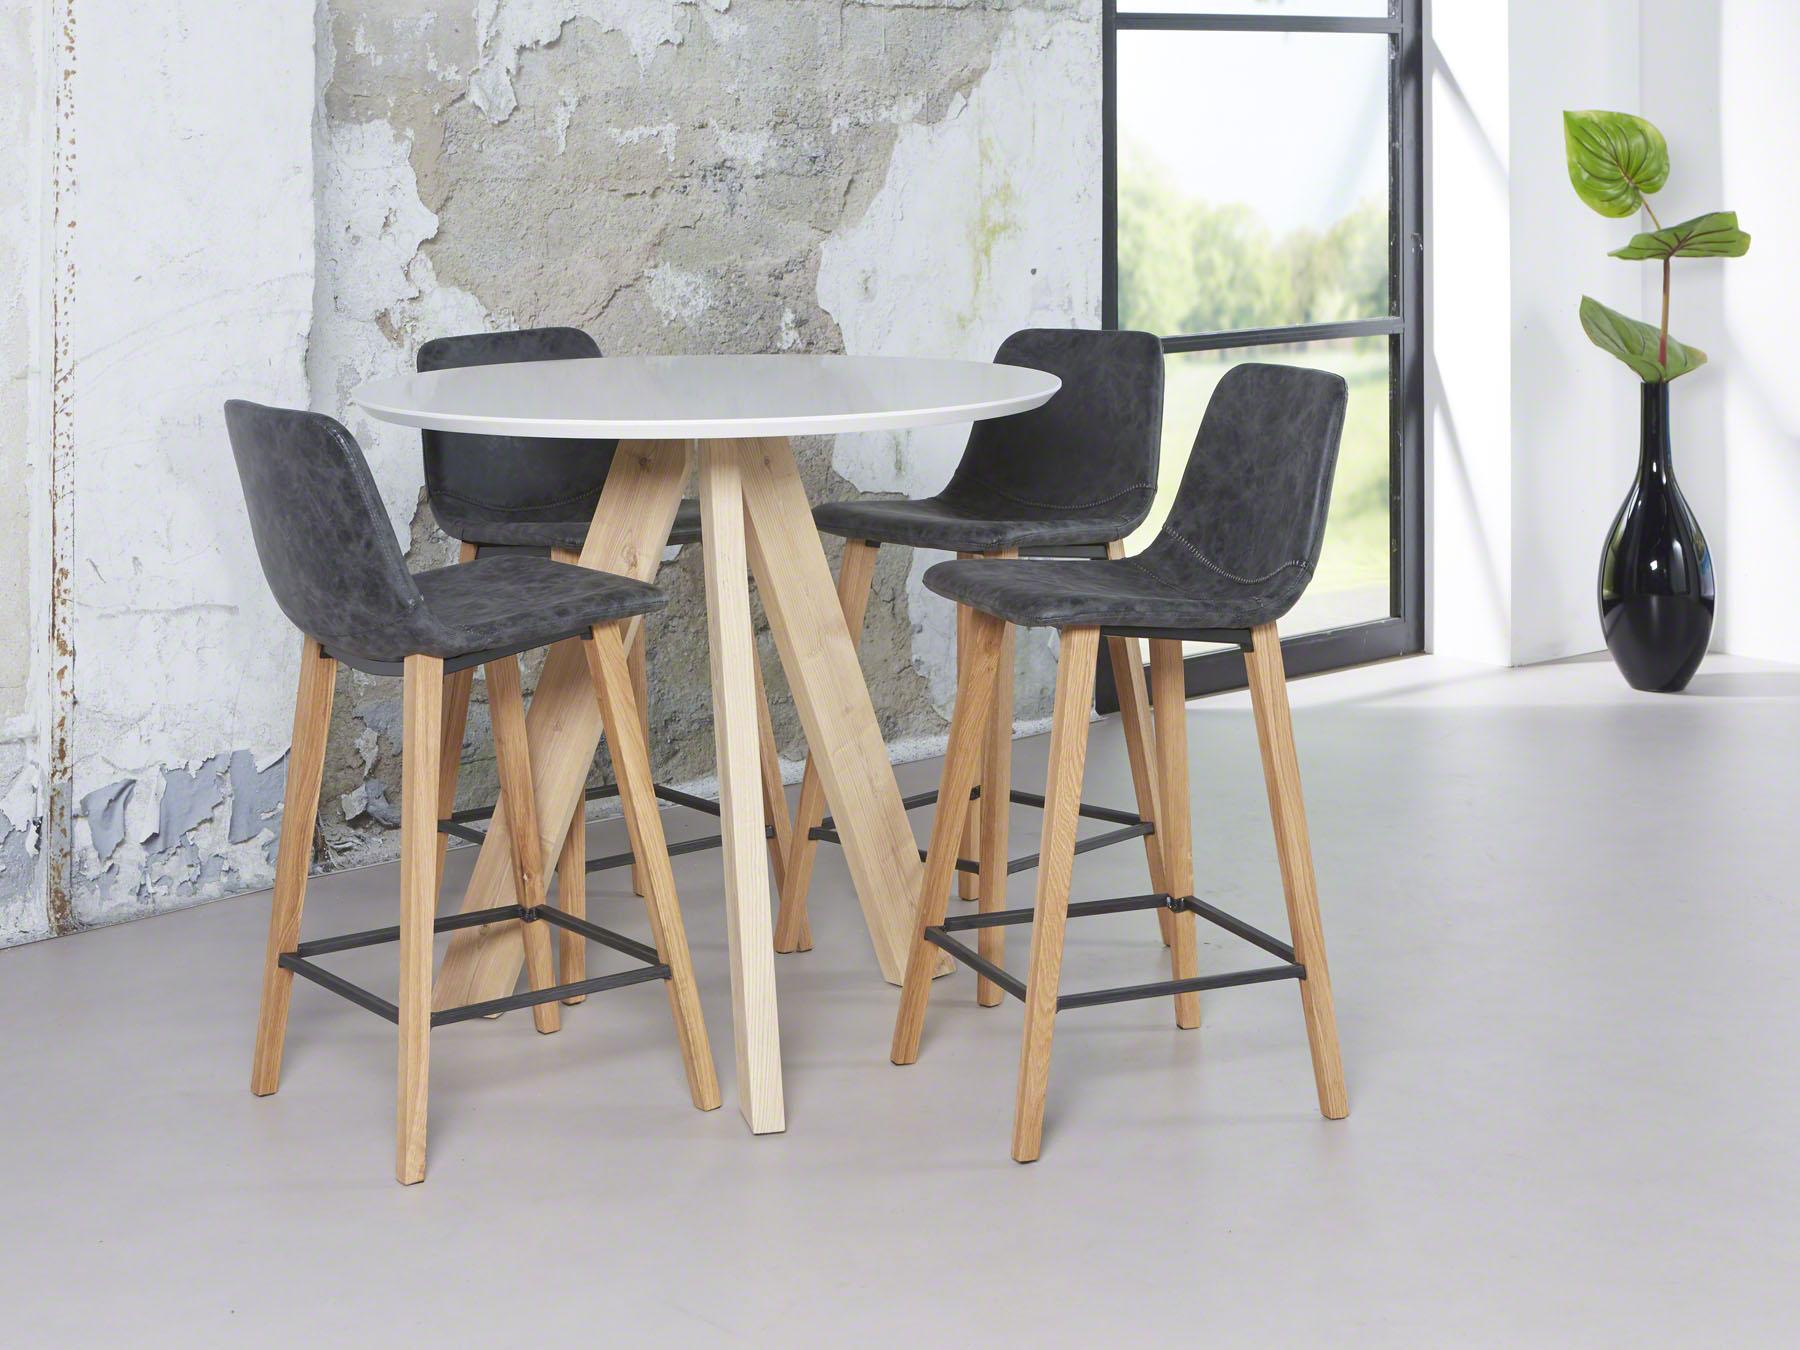 Moderne Salontafel Mat Wit.Bartafel Modern Voor In De Moderne Woonomgeving Aktie Wonen Nl